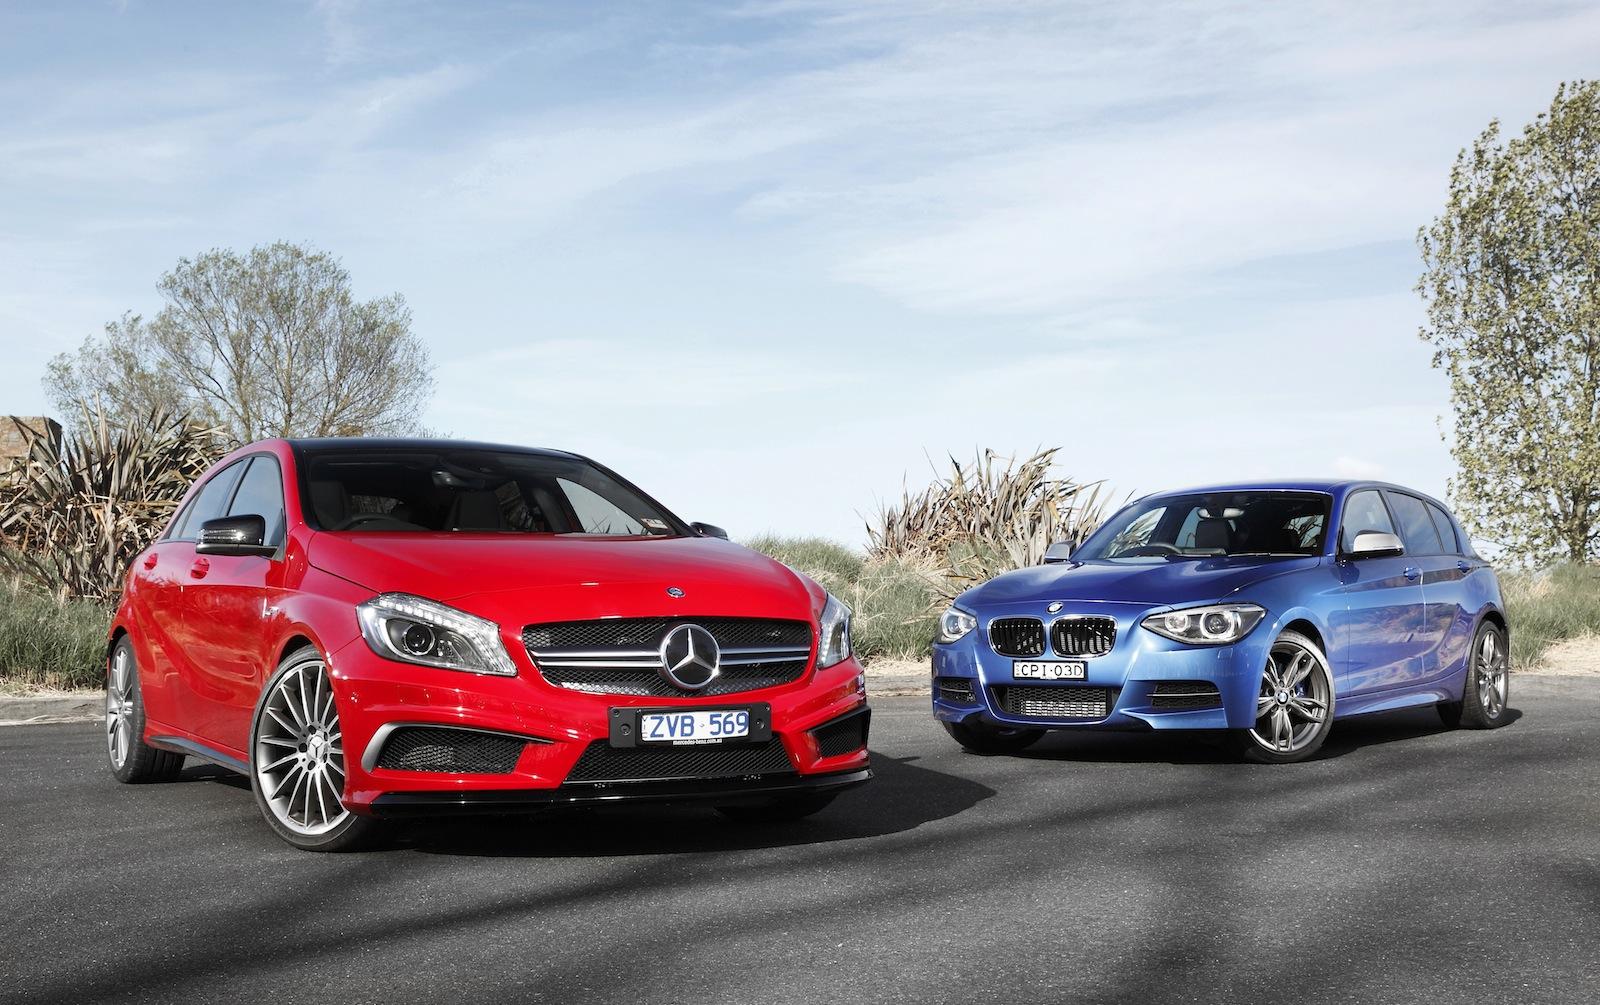 2013 BMW M135i vs Mercedes-Benz A45 AMG Comparison Test by ...